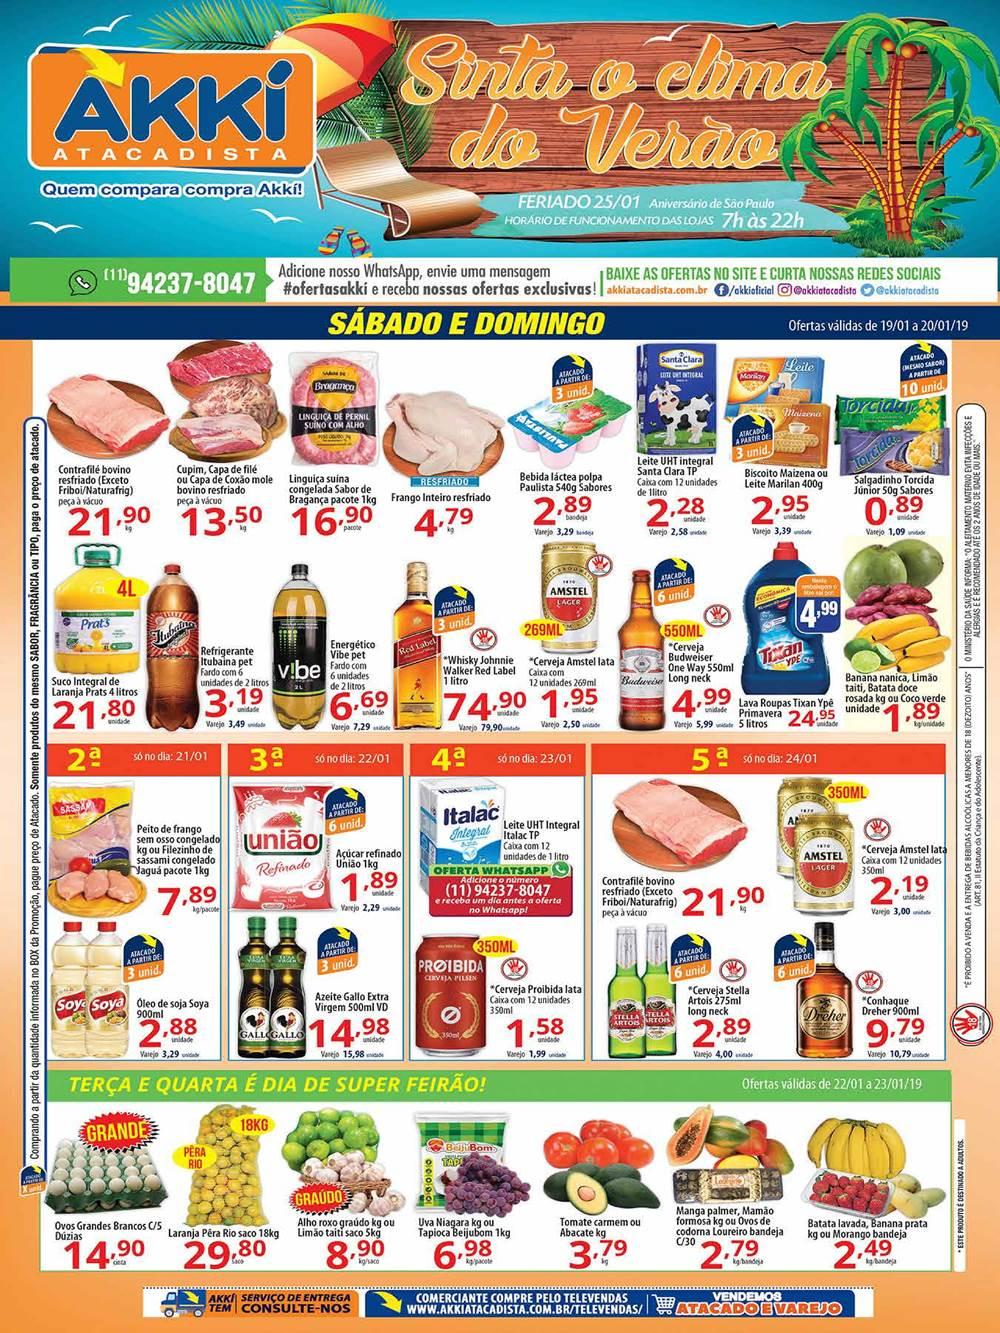 Ofertas-Akki1-1 Ofertas de Supermercados - Economize!